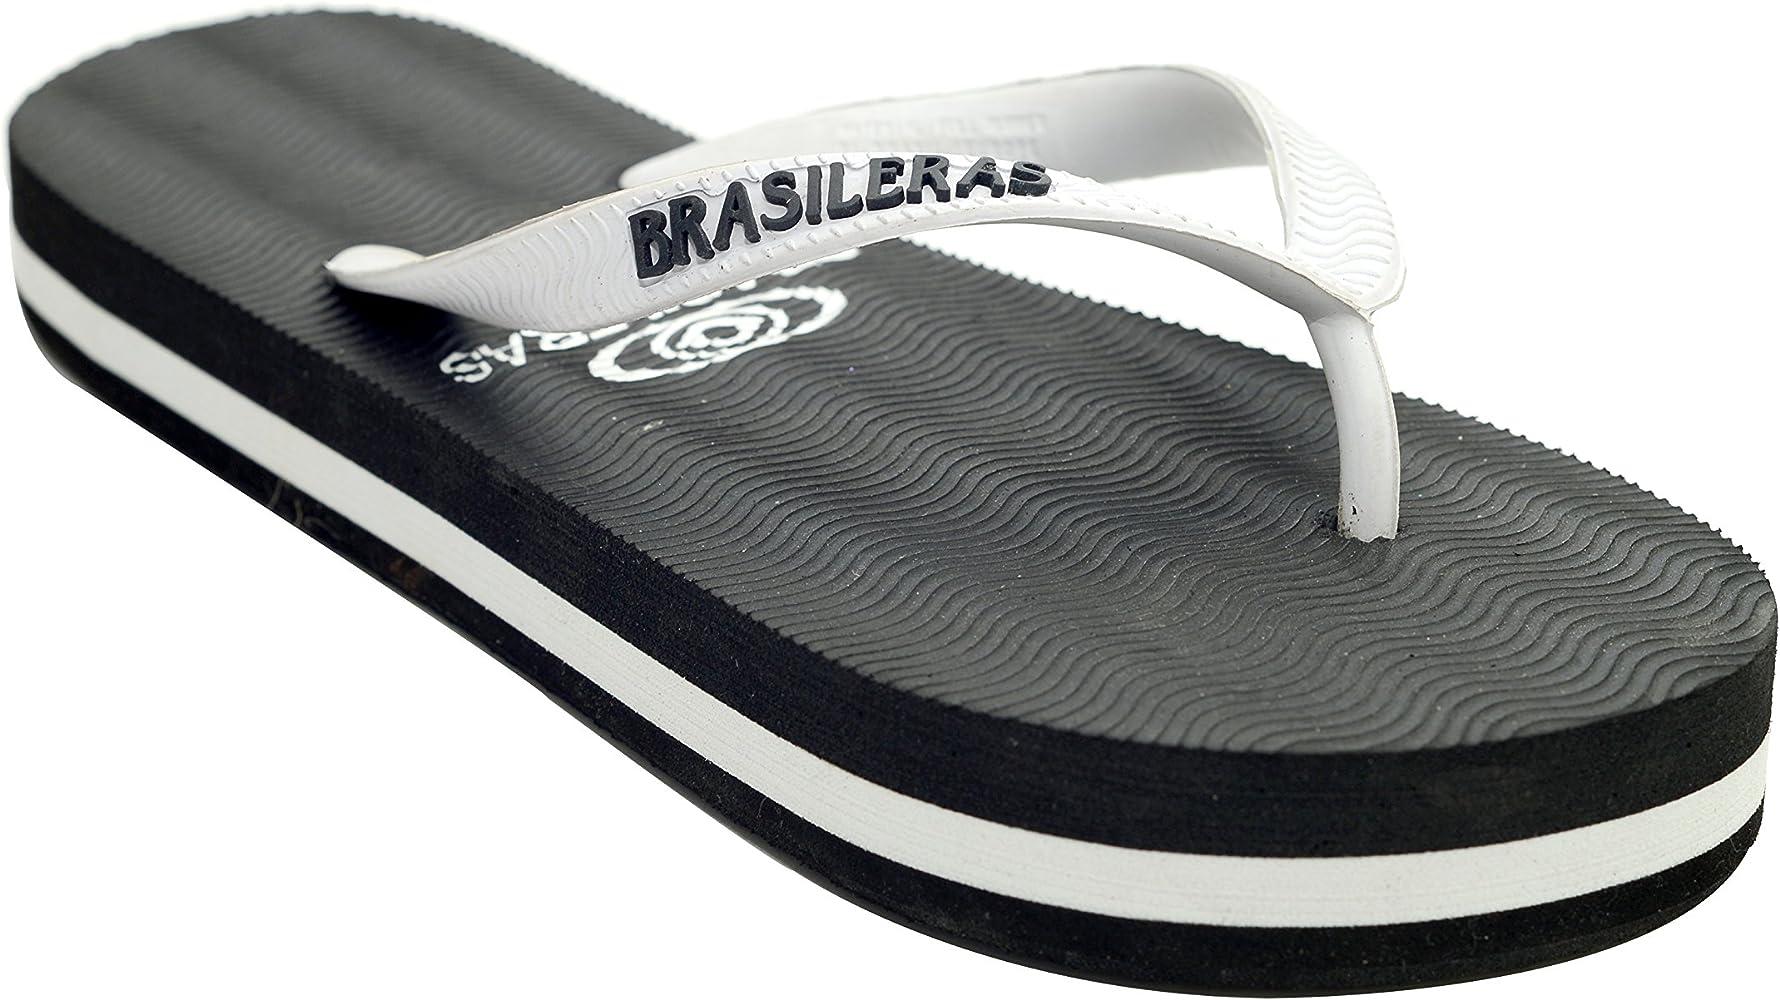 Brasileras Flip Flop Sandalia Plataforma Pequeño Blanco 9 10 B M Us Shoes